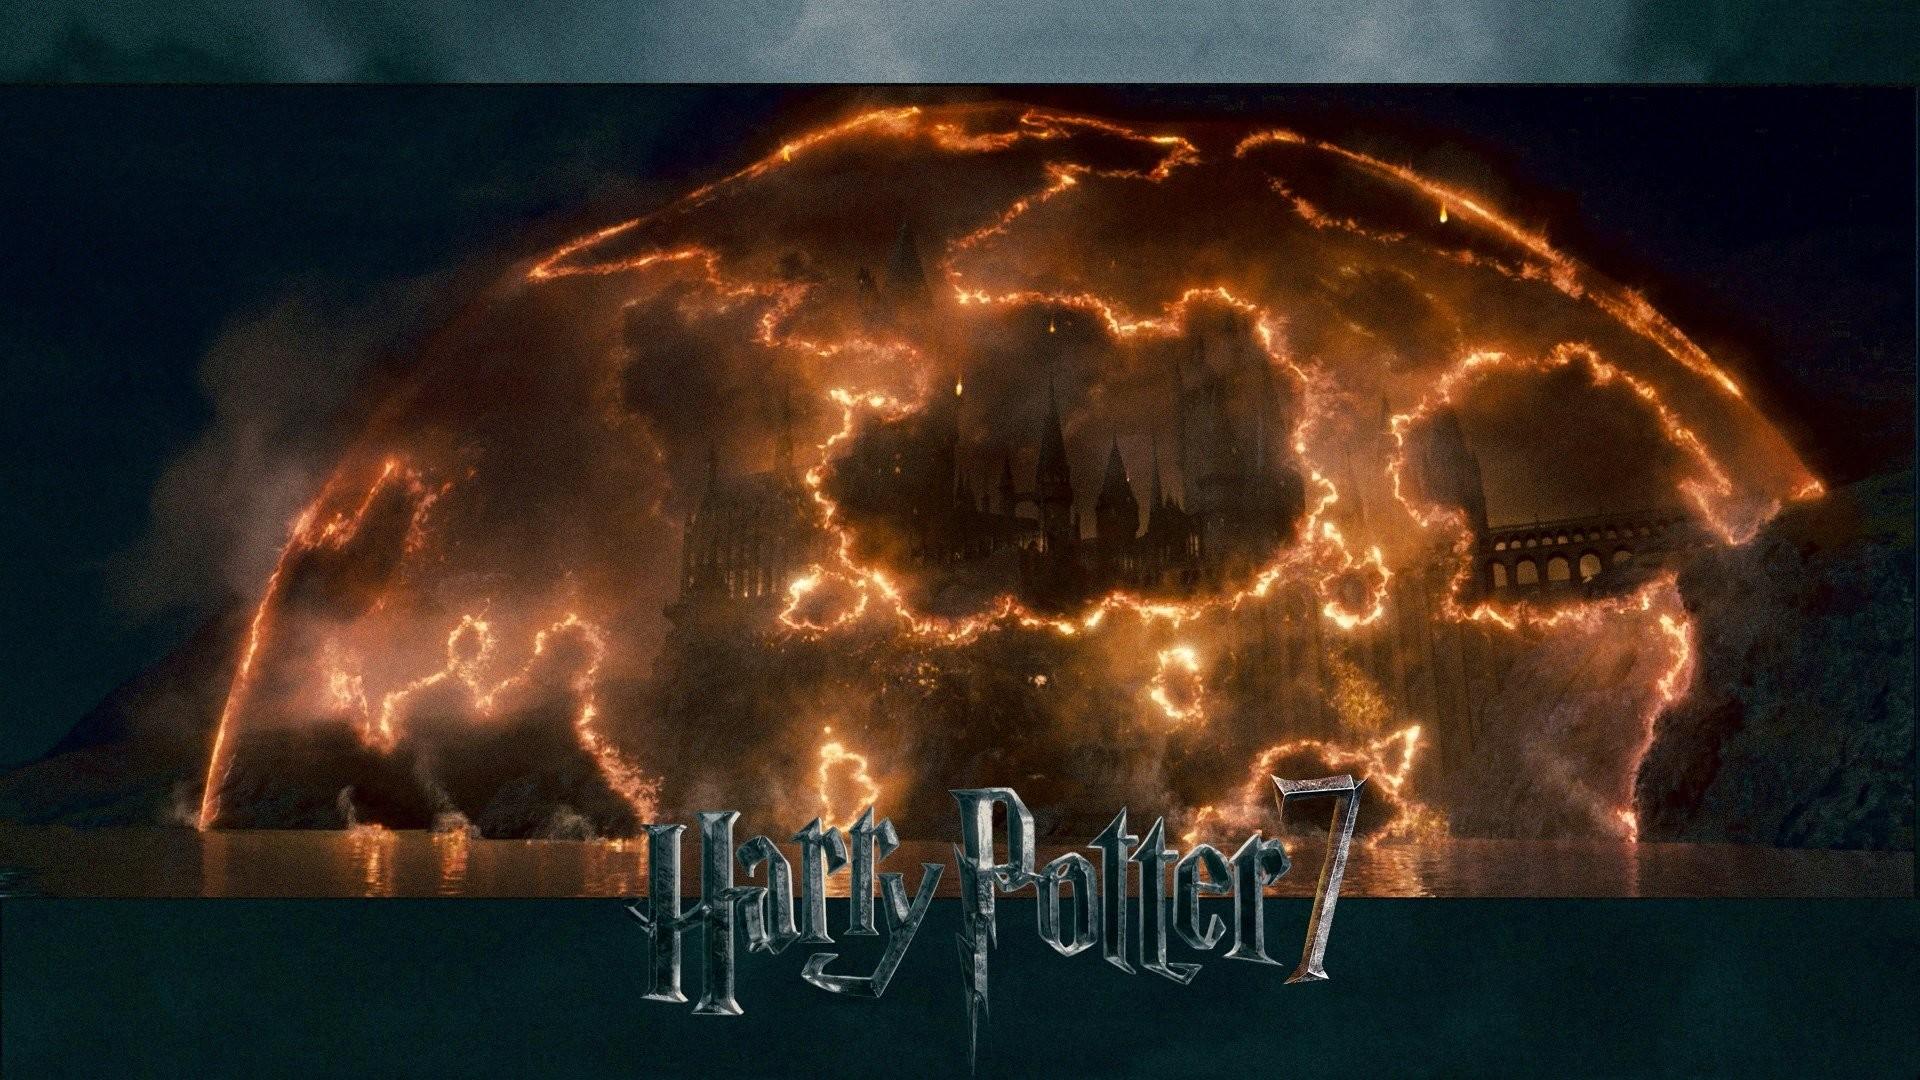 Must see Wallpaper Harry Potter Imac - 17526  Pic_561785.jpg